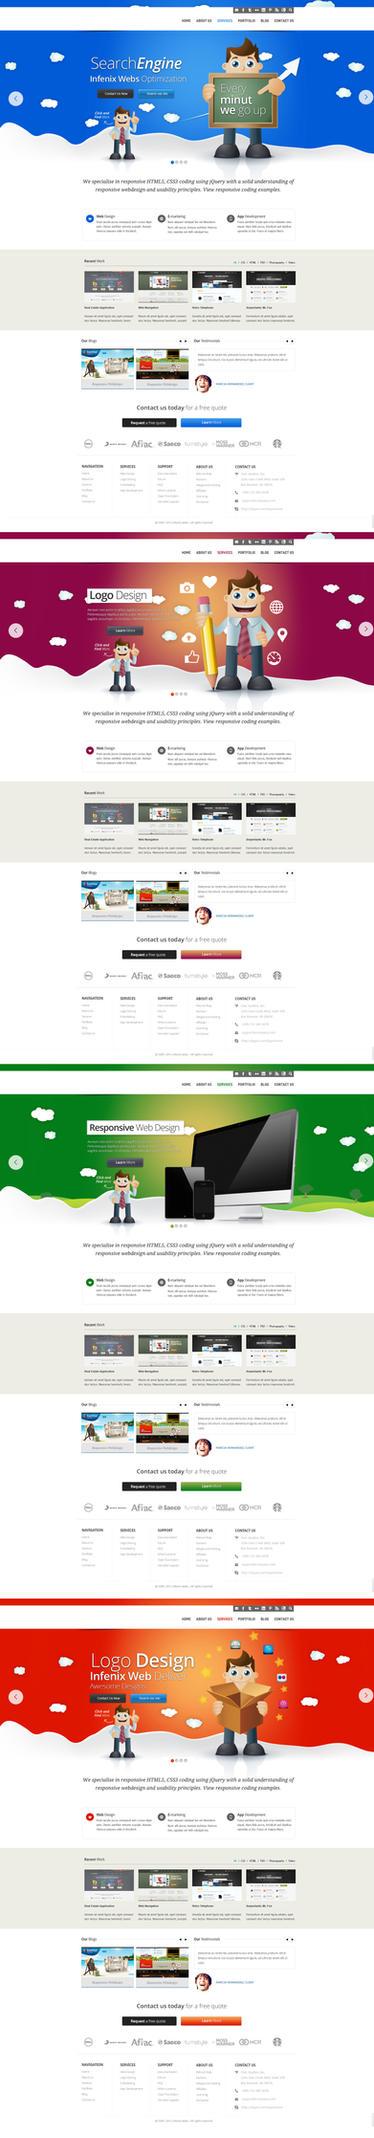 Seo + Marketing Company Web Design by vasiligfx